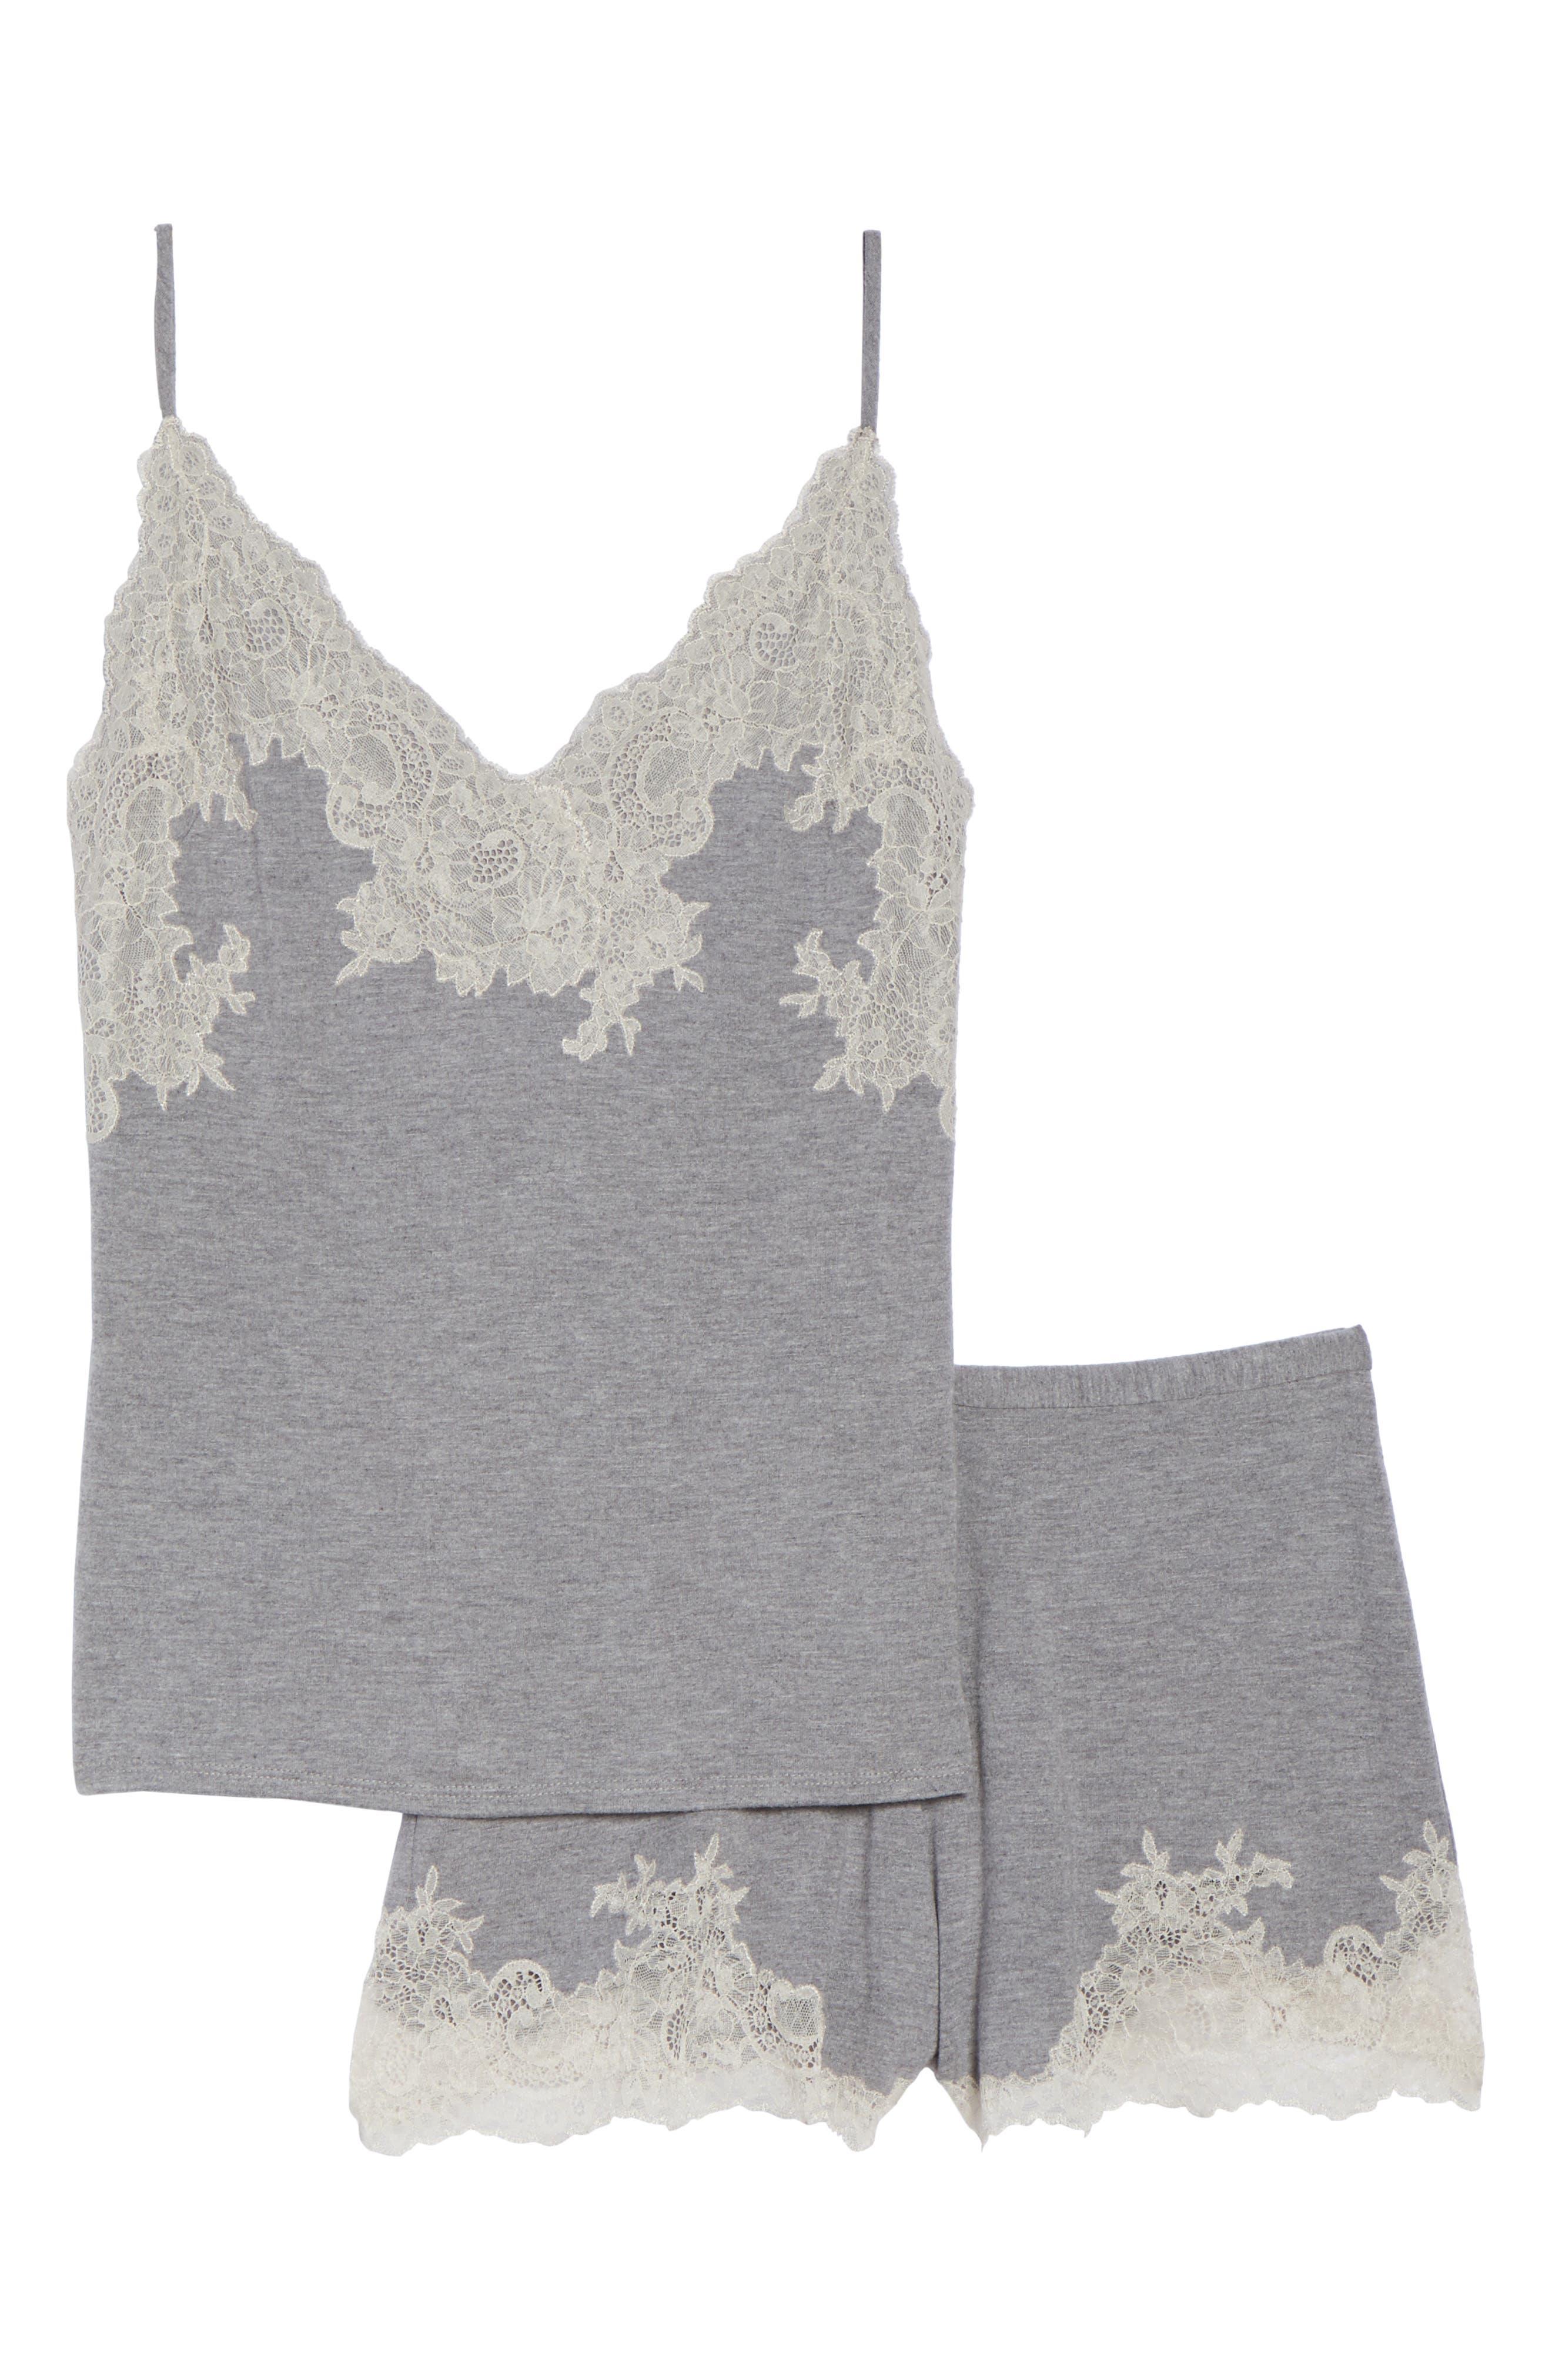 Luxe Shangri-La Short Pajamas,                             Alternate thumbnail 8, color,                             GREY